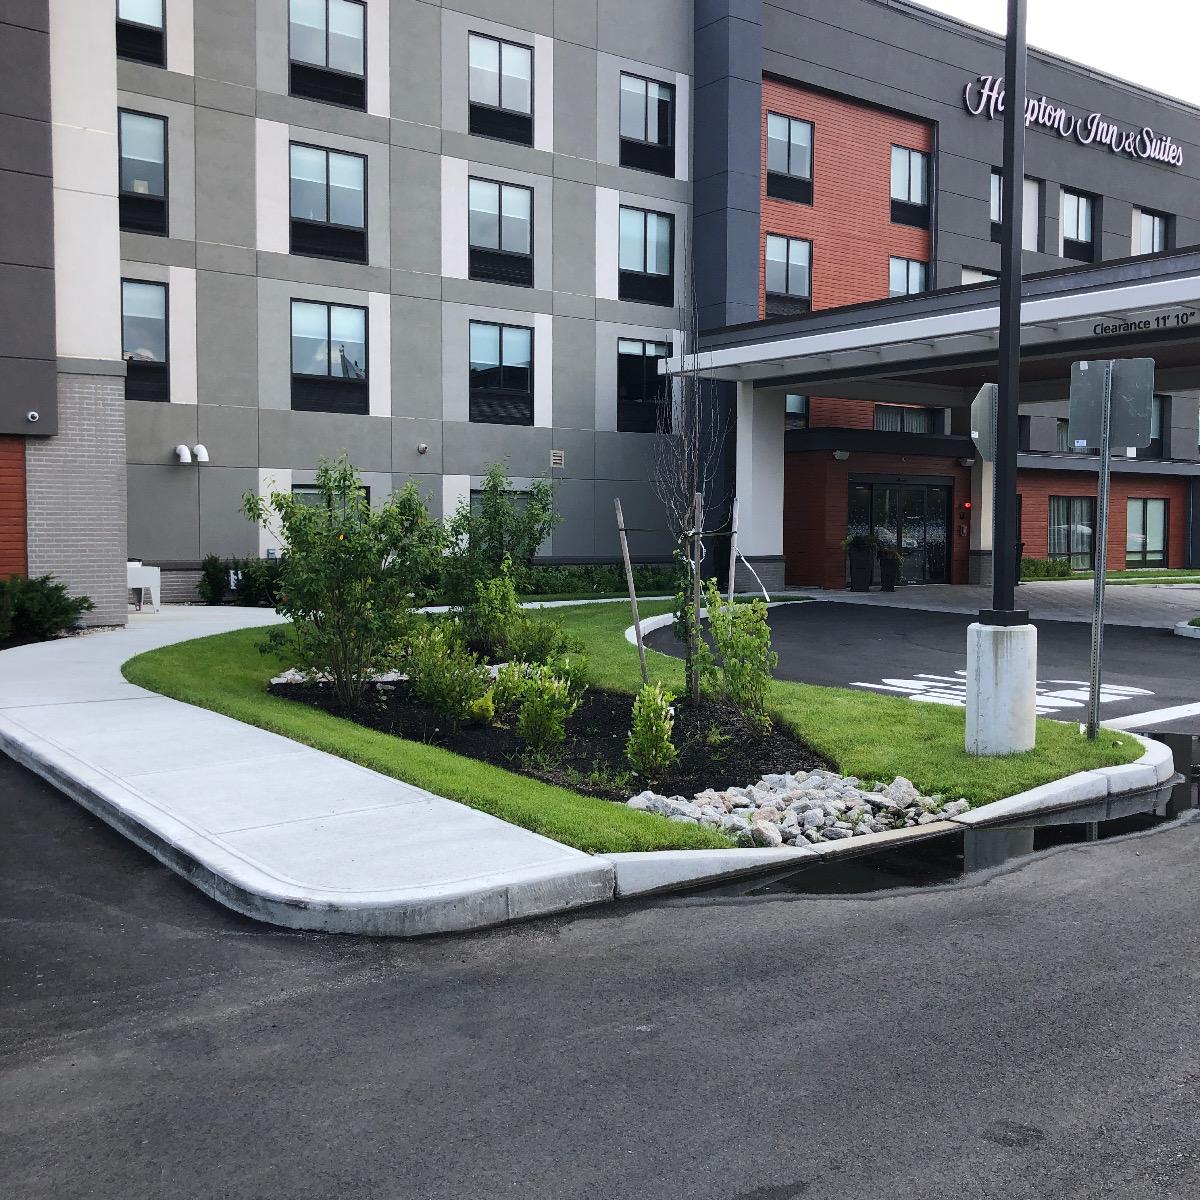 Hampton Inn & Suites Landscaping